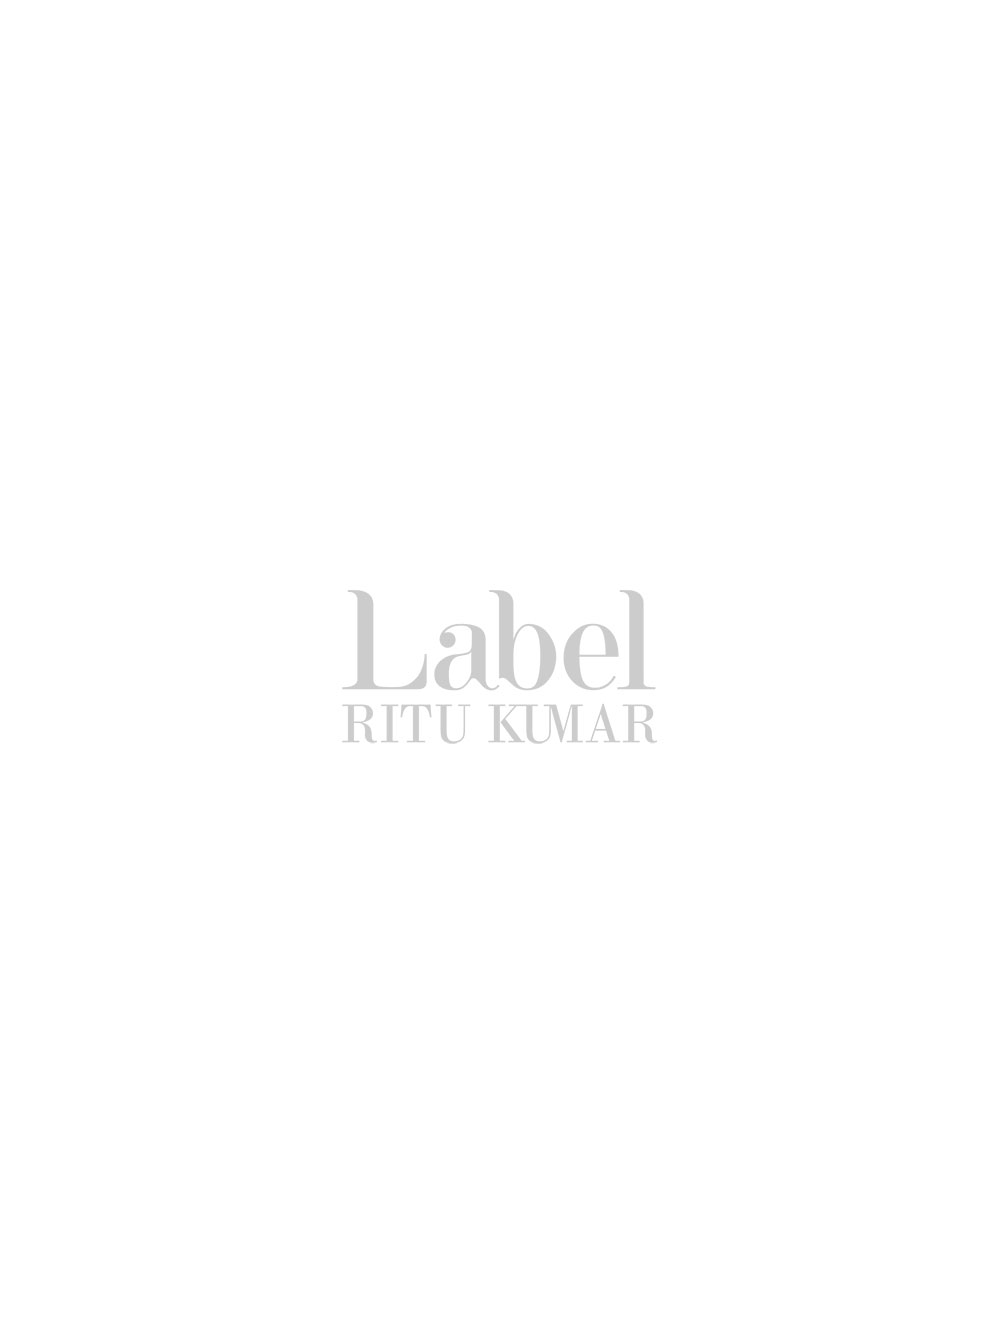 Olive Print Long Dress By label Ritu Kumar